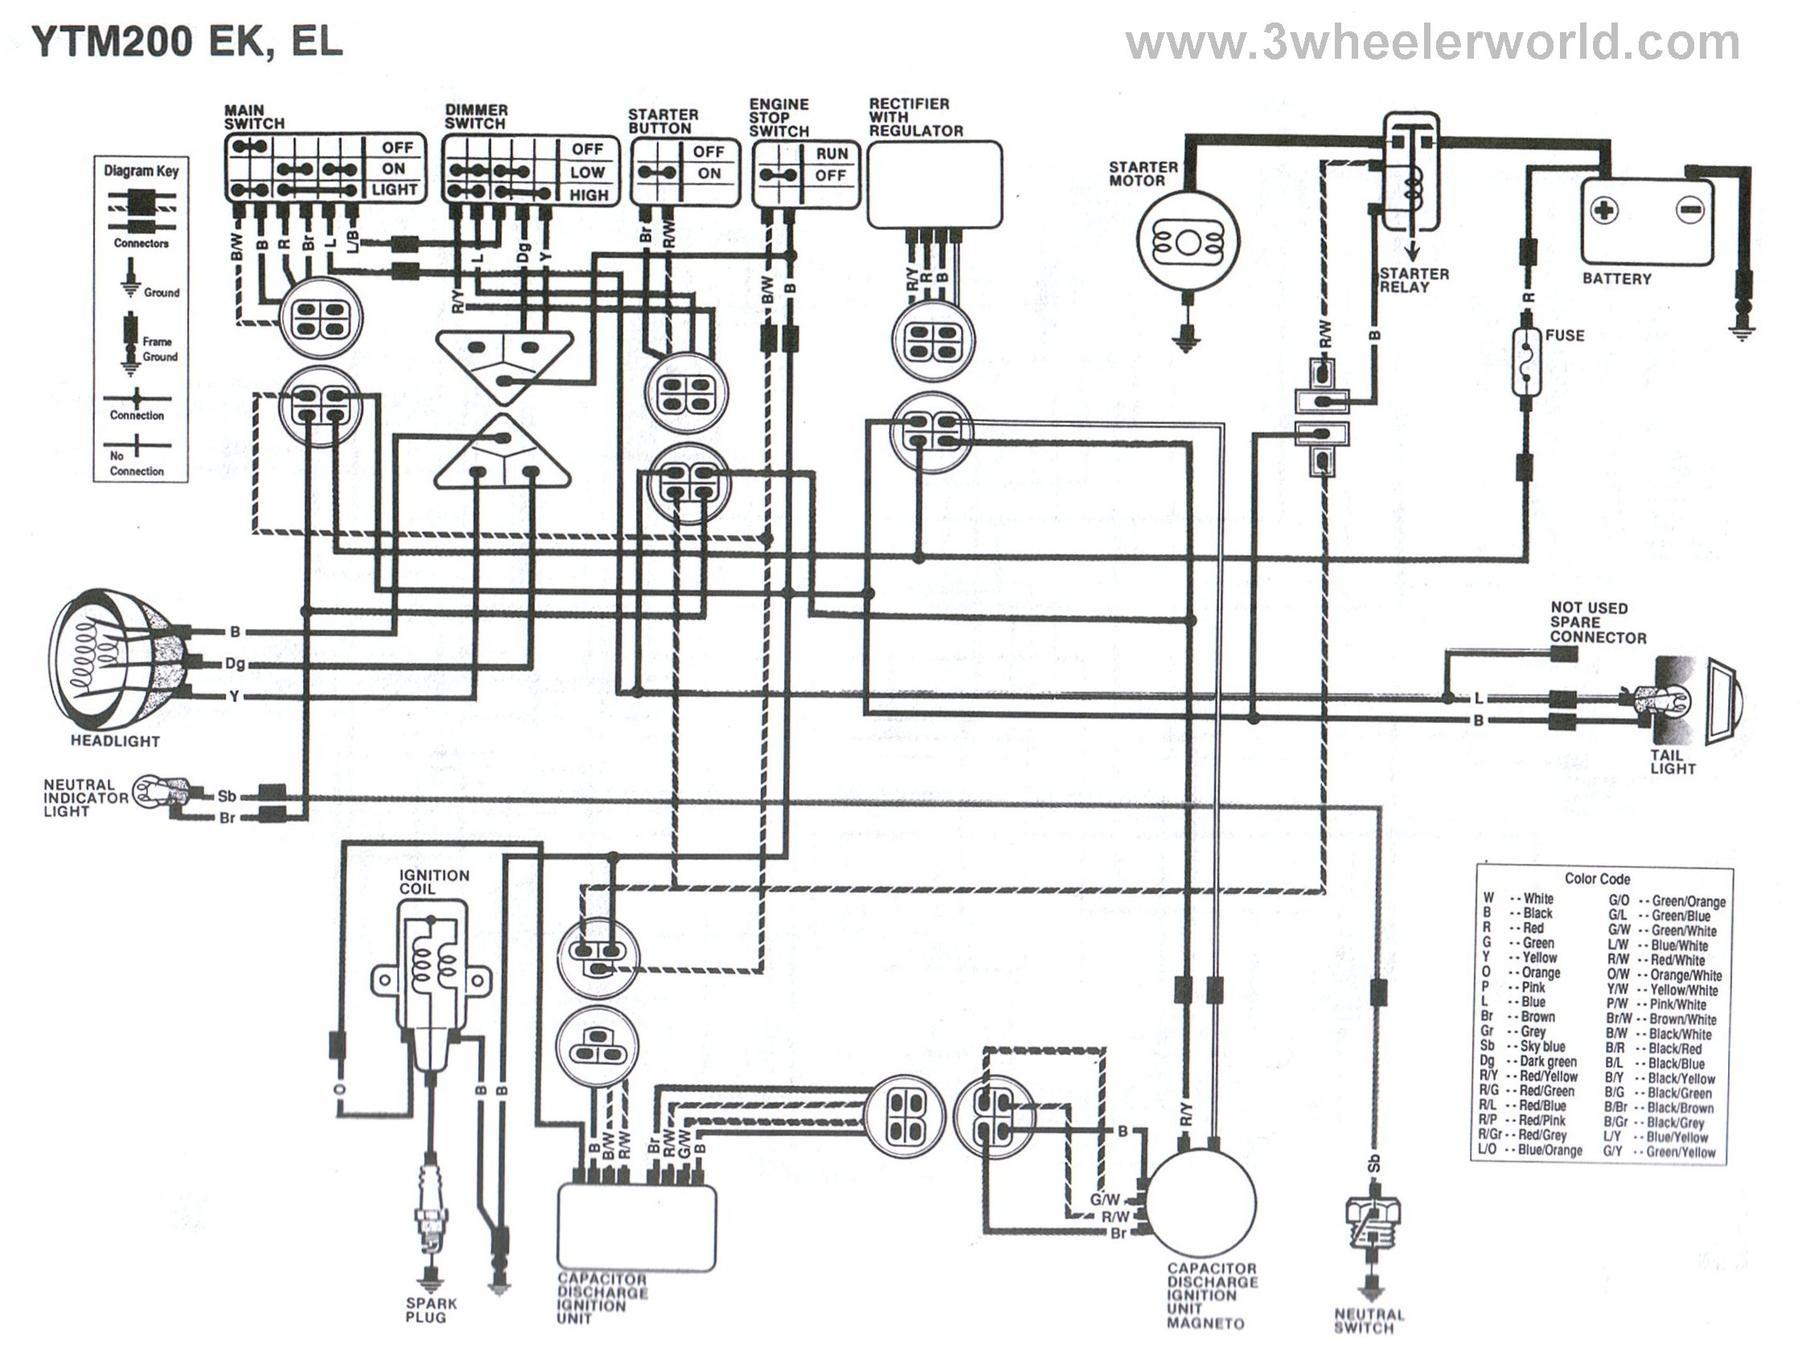 winnebago wiring schematic winnebago image wiring winnebago aspect wiring diagram winnebago auto wiring diagram on winnebago wiring schematic